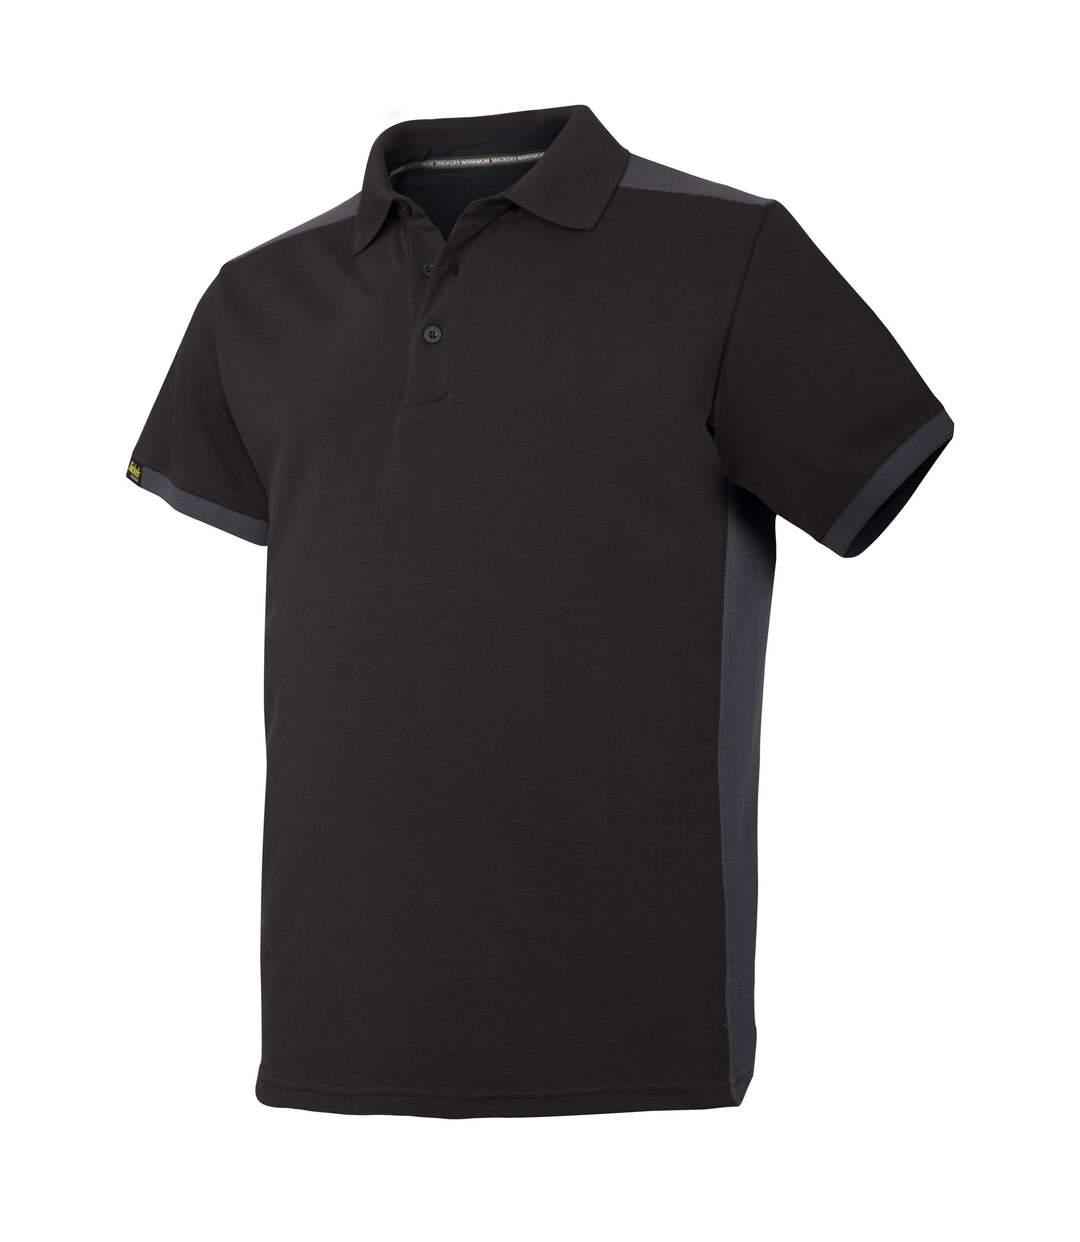 Snickers Mens AllroundWork Short Sleeve Polo Shirt (Black/Steel Grey) - UTRW5483